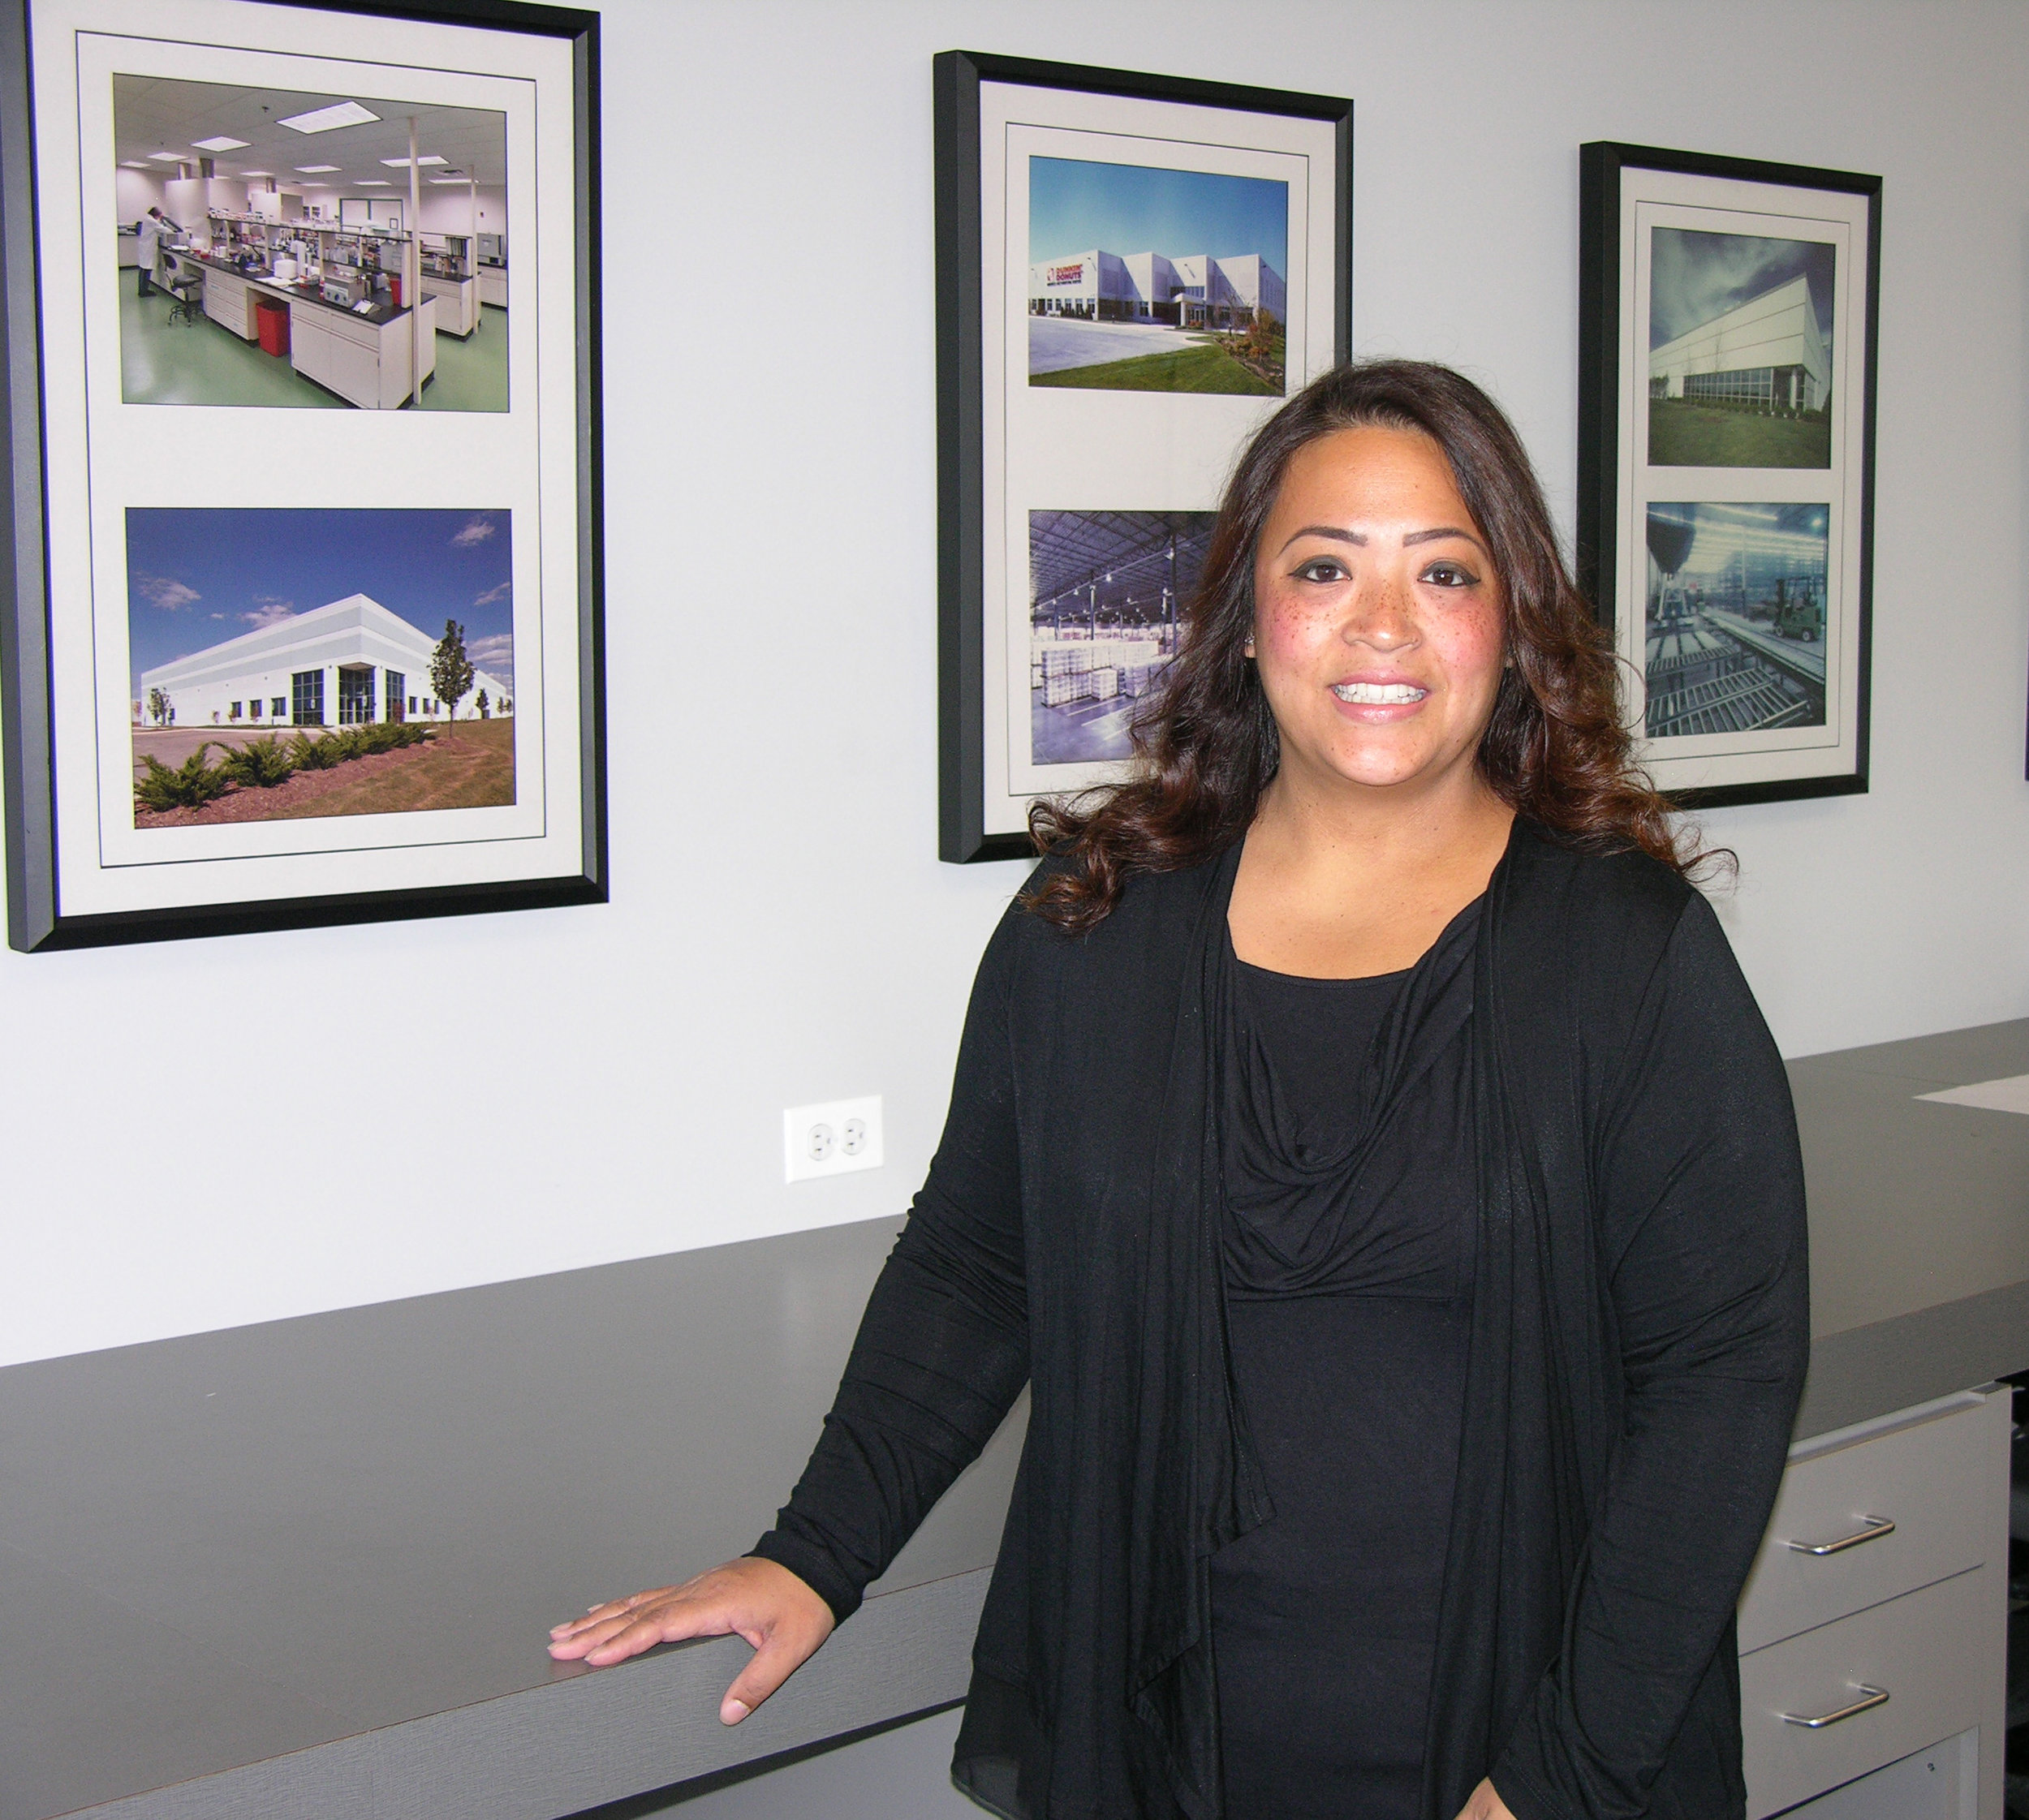 Zara Suarez, Assistant Property Manager